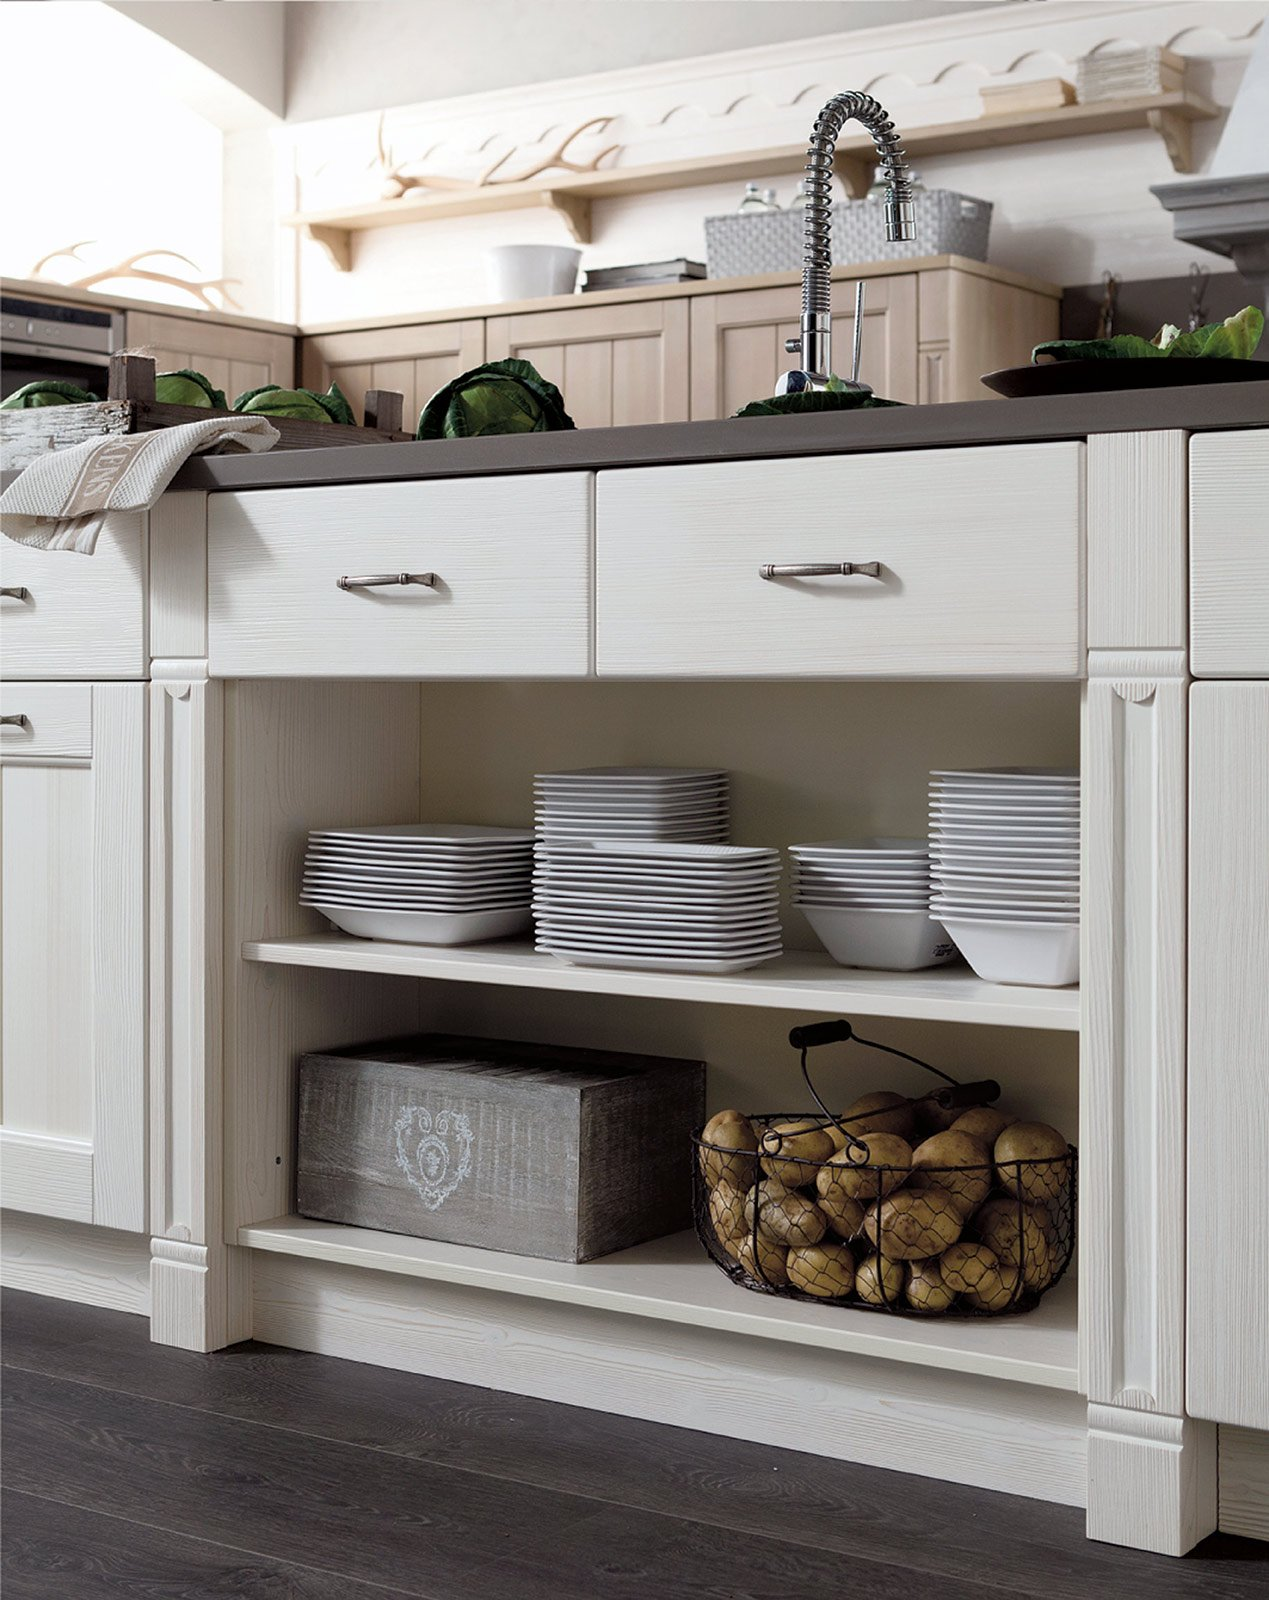 cucina: che moduli scelgo per la dispensa - cose di casa - Ikea Cassetti Cucina